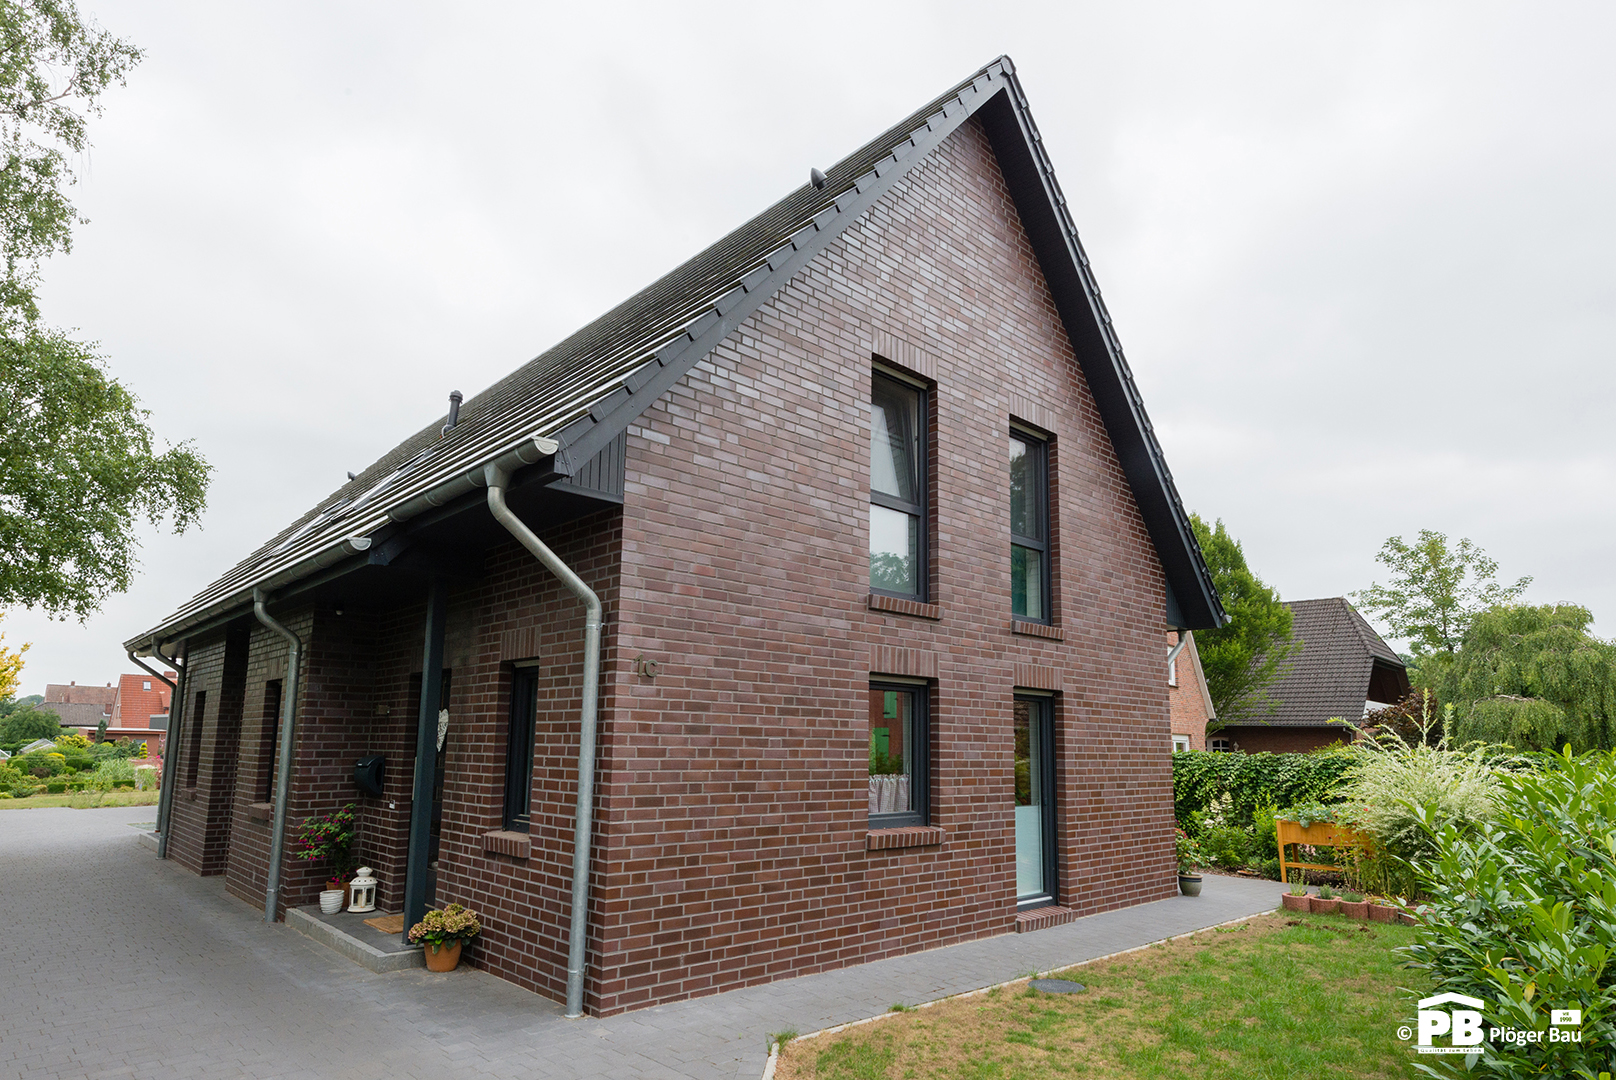 werkhalle51_Twistringen_Ploeger_7